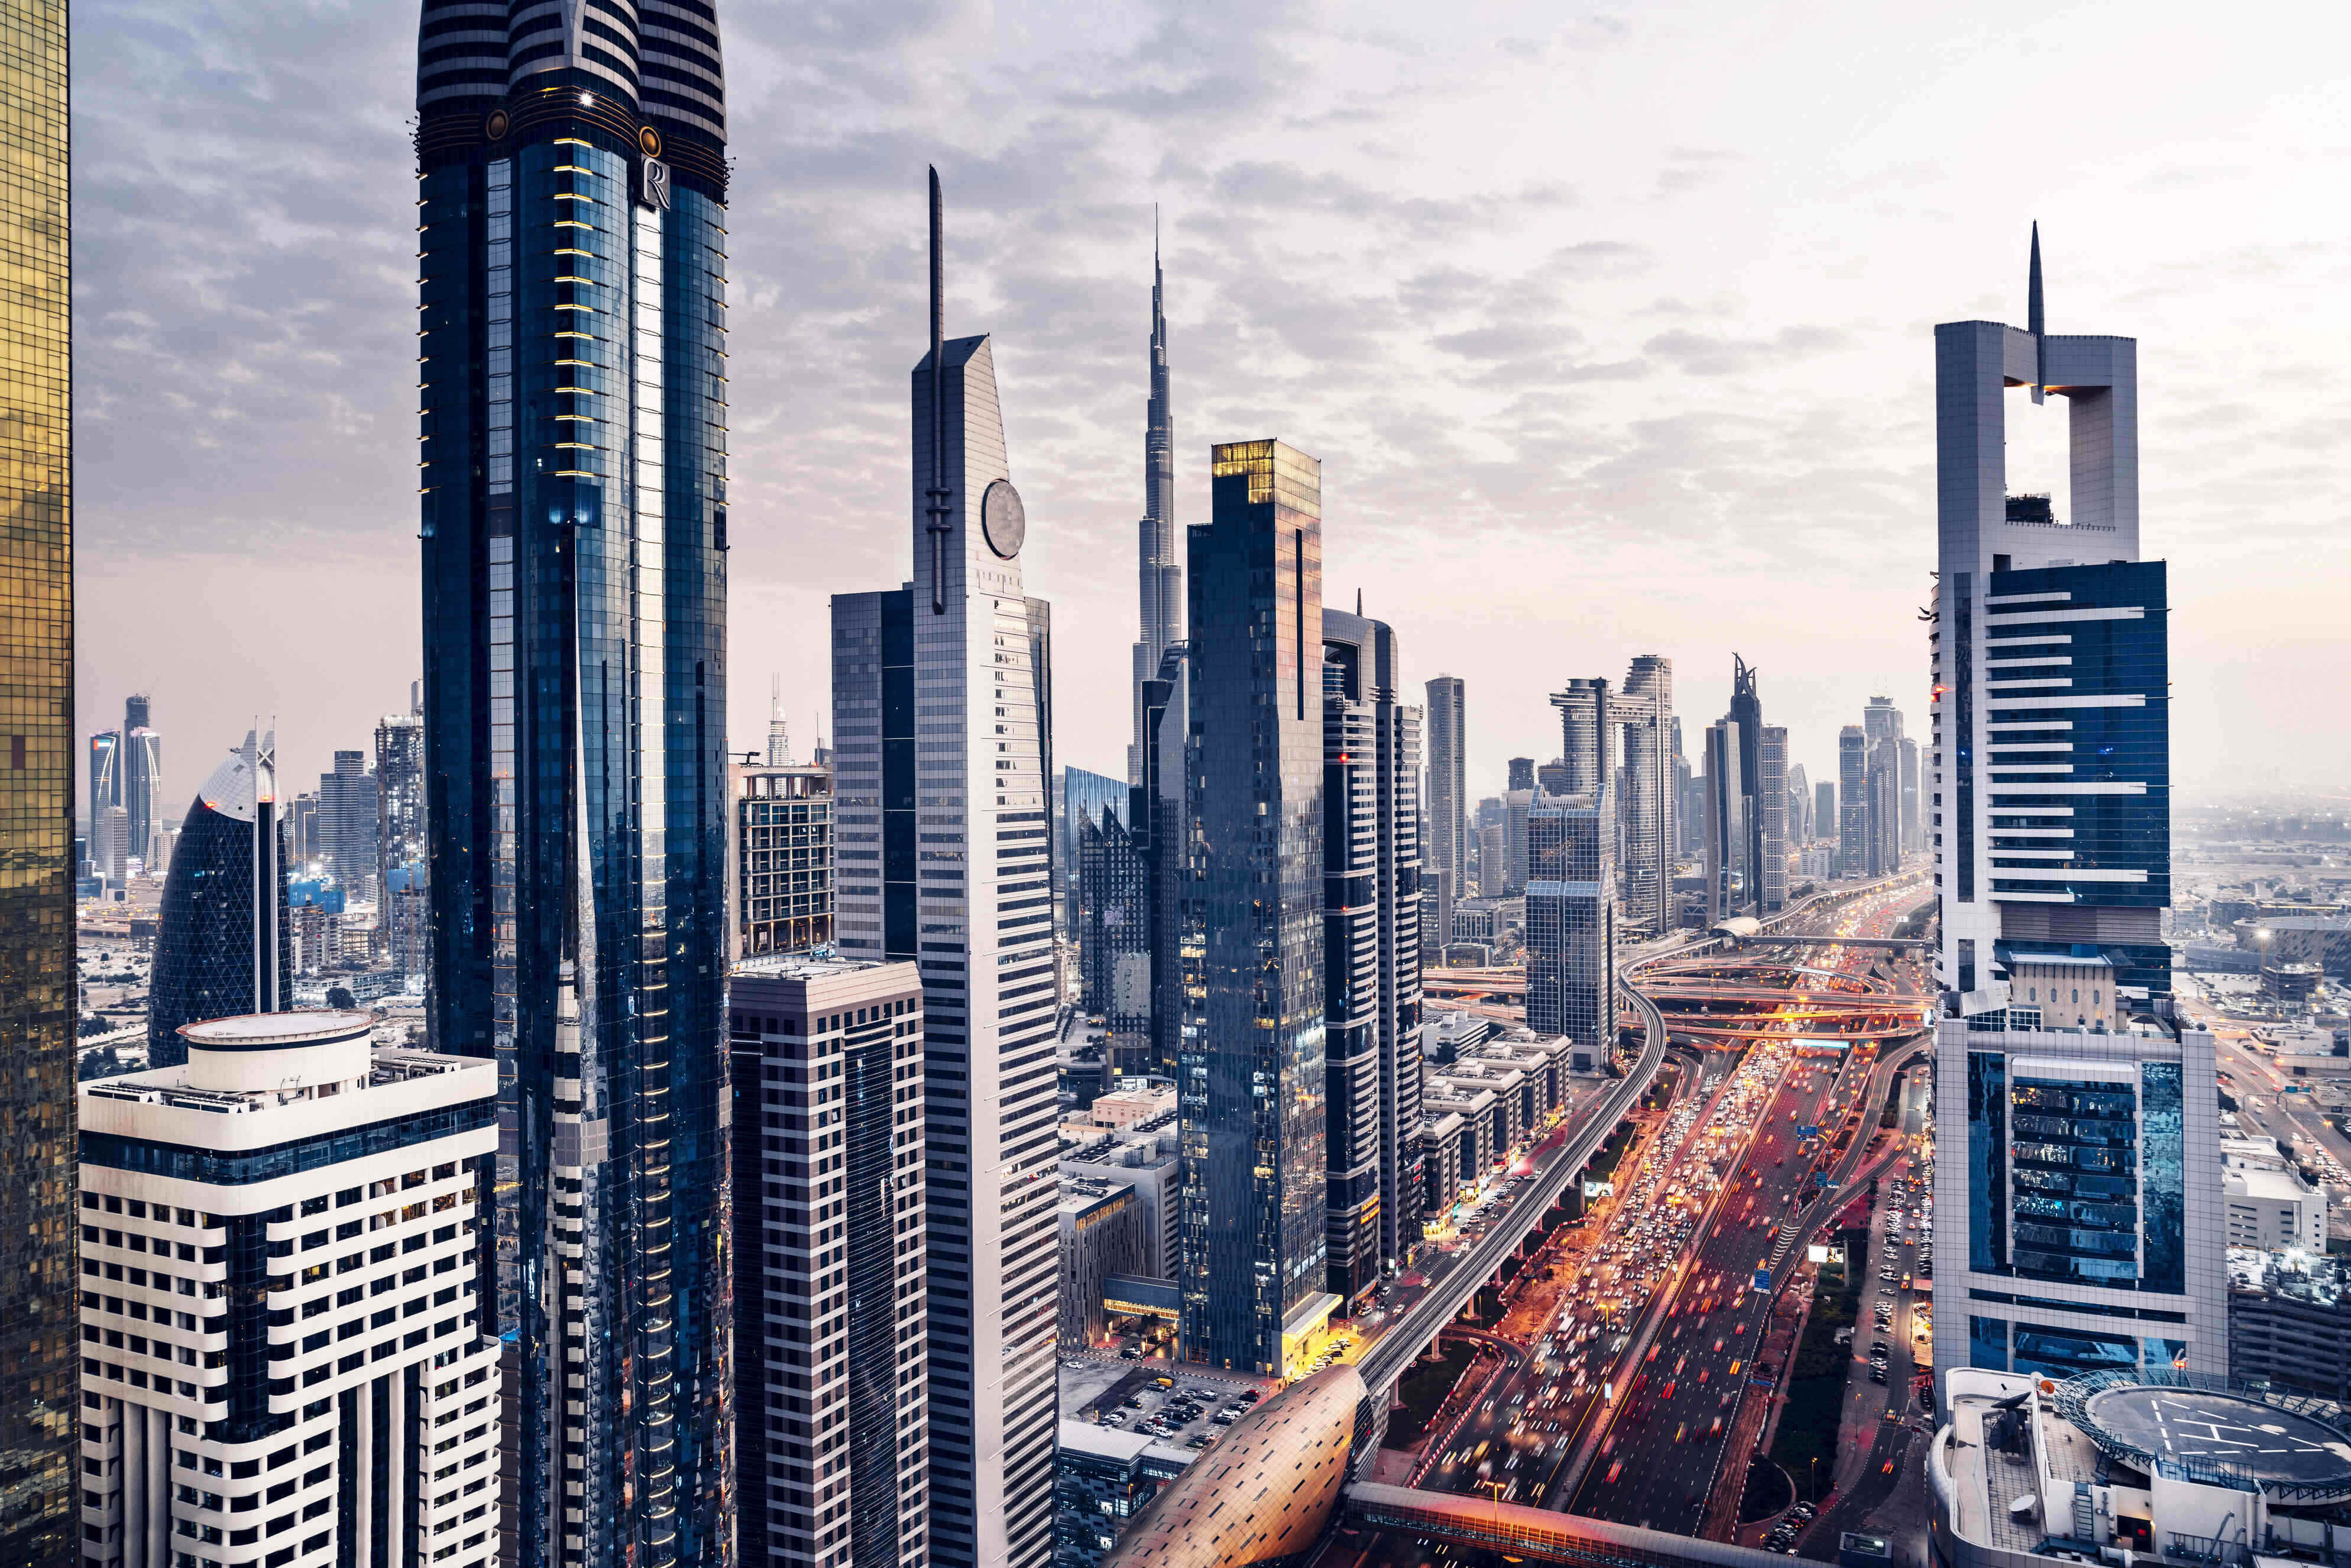 Дубай бизнес купить квартиру нью-йорк